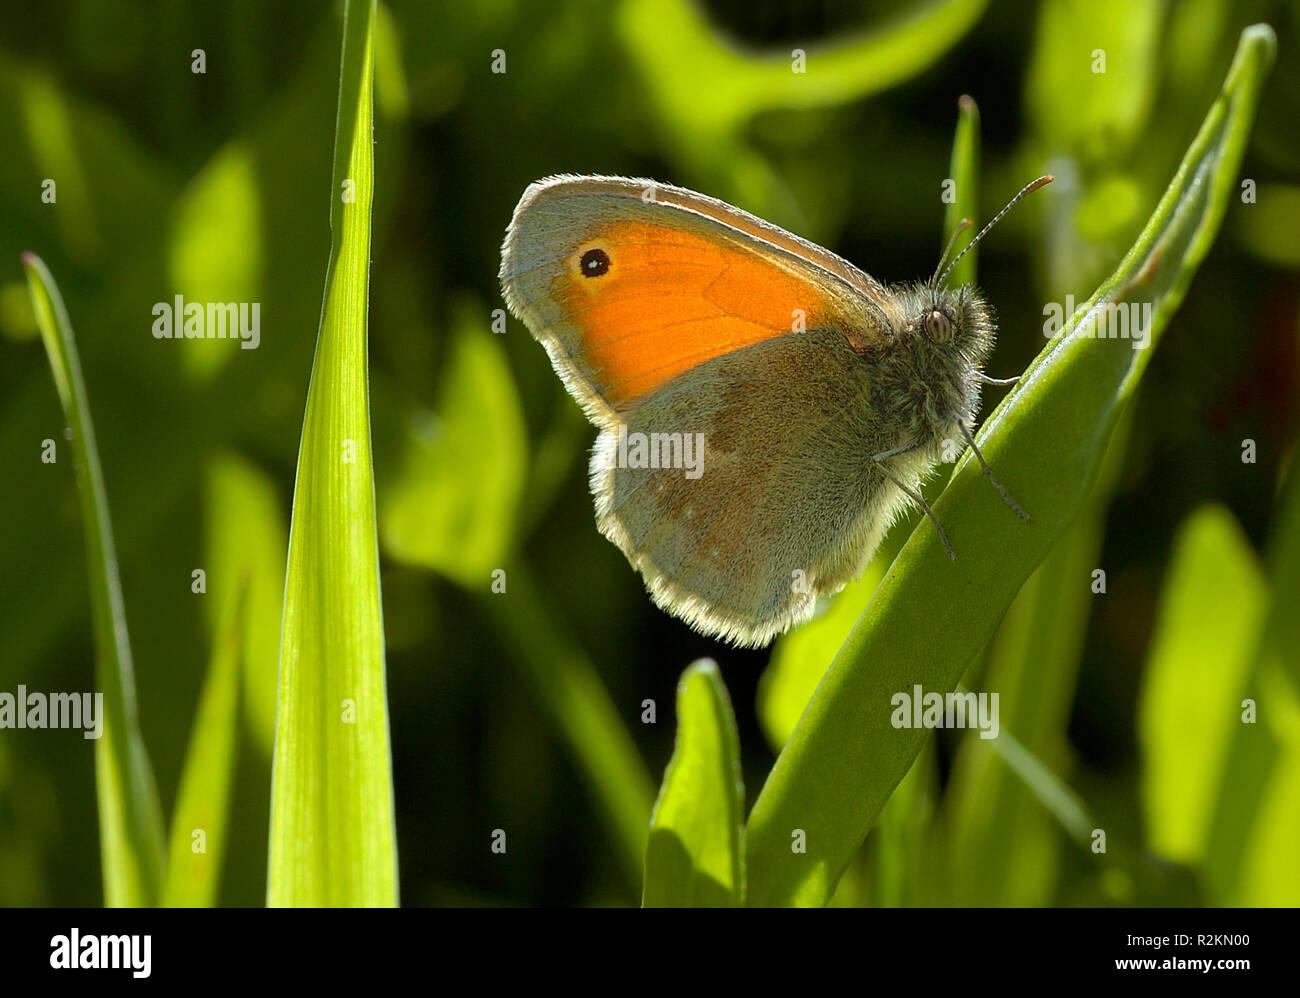 small heufalter - Stock Image